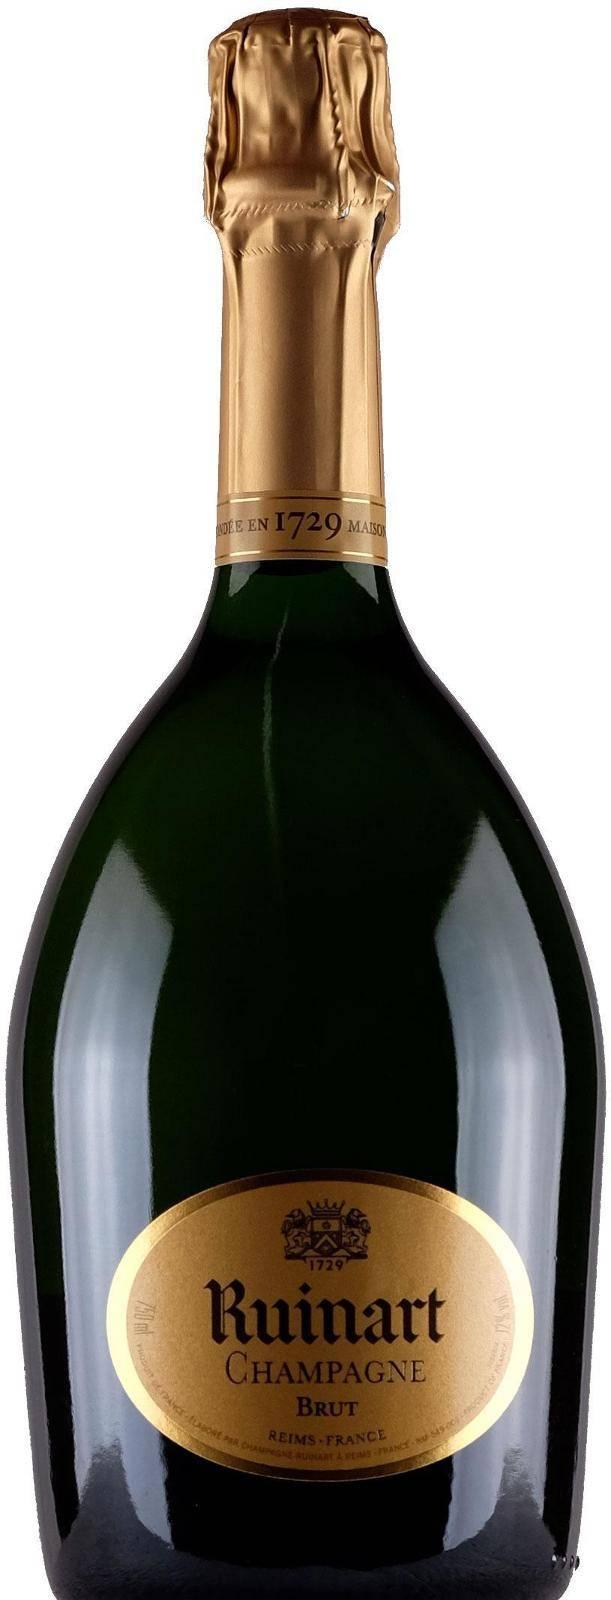 vinos vanidad champagne ruinat